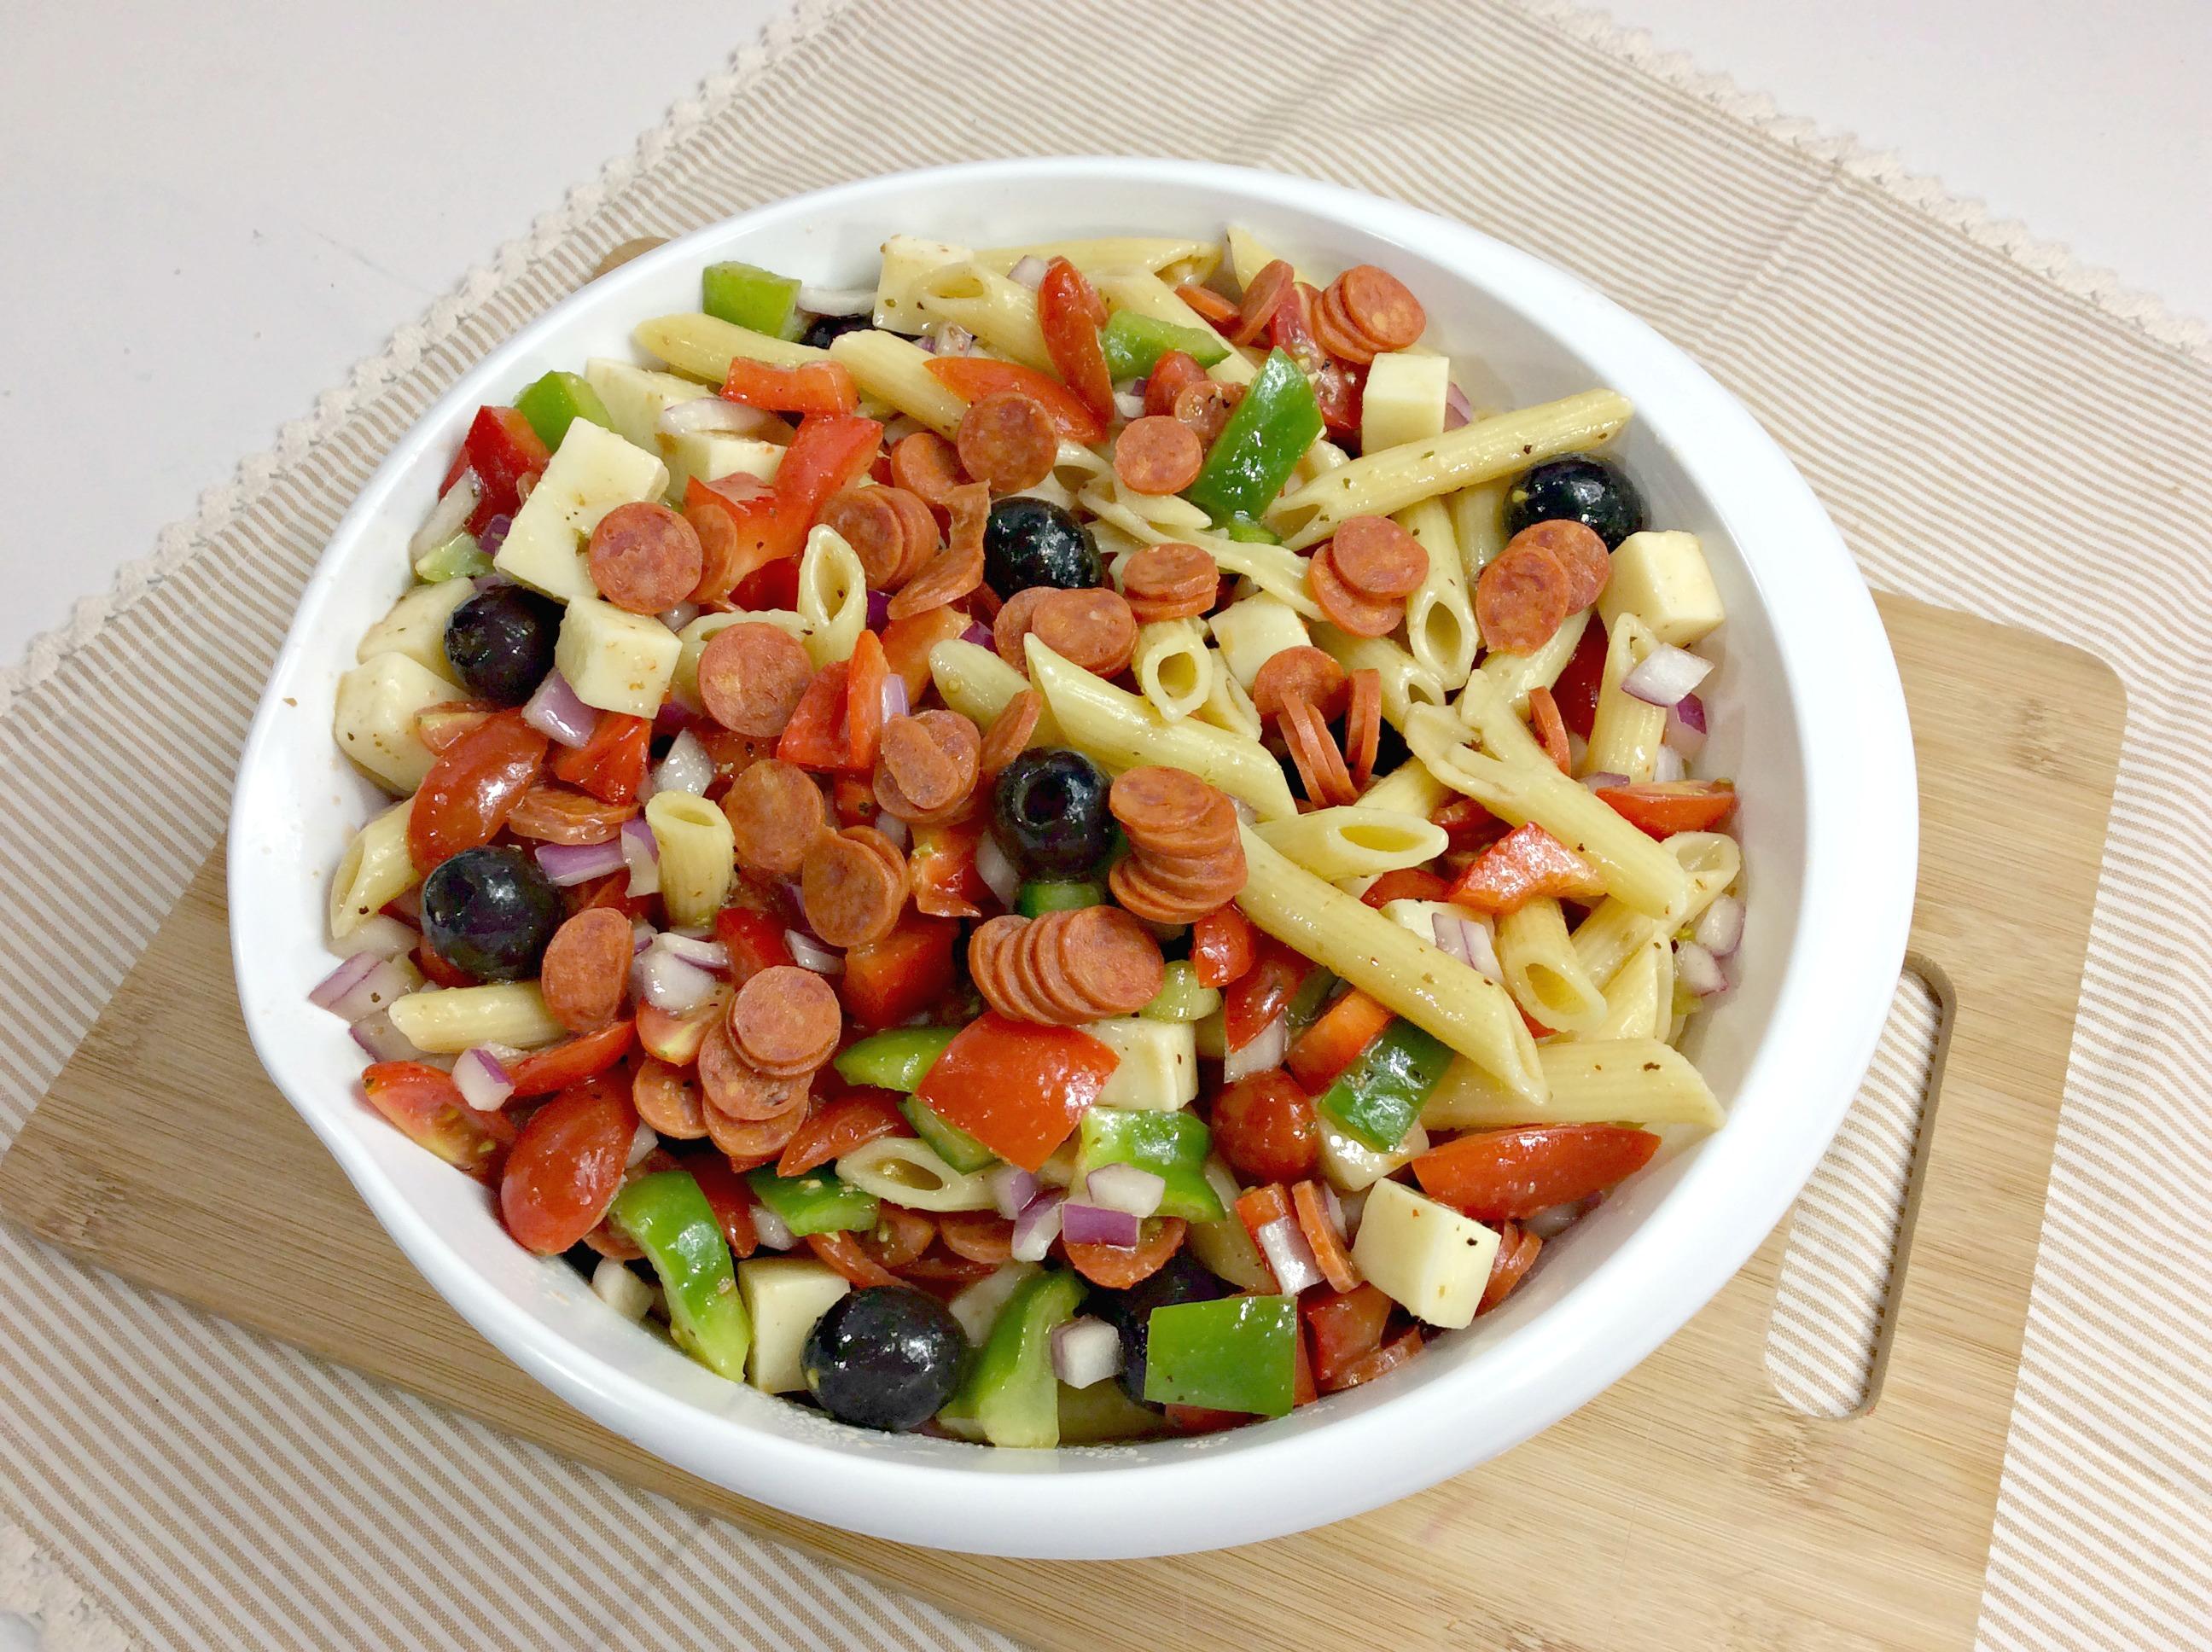 Weight Watcher's Pizza Pasta Salad